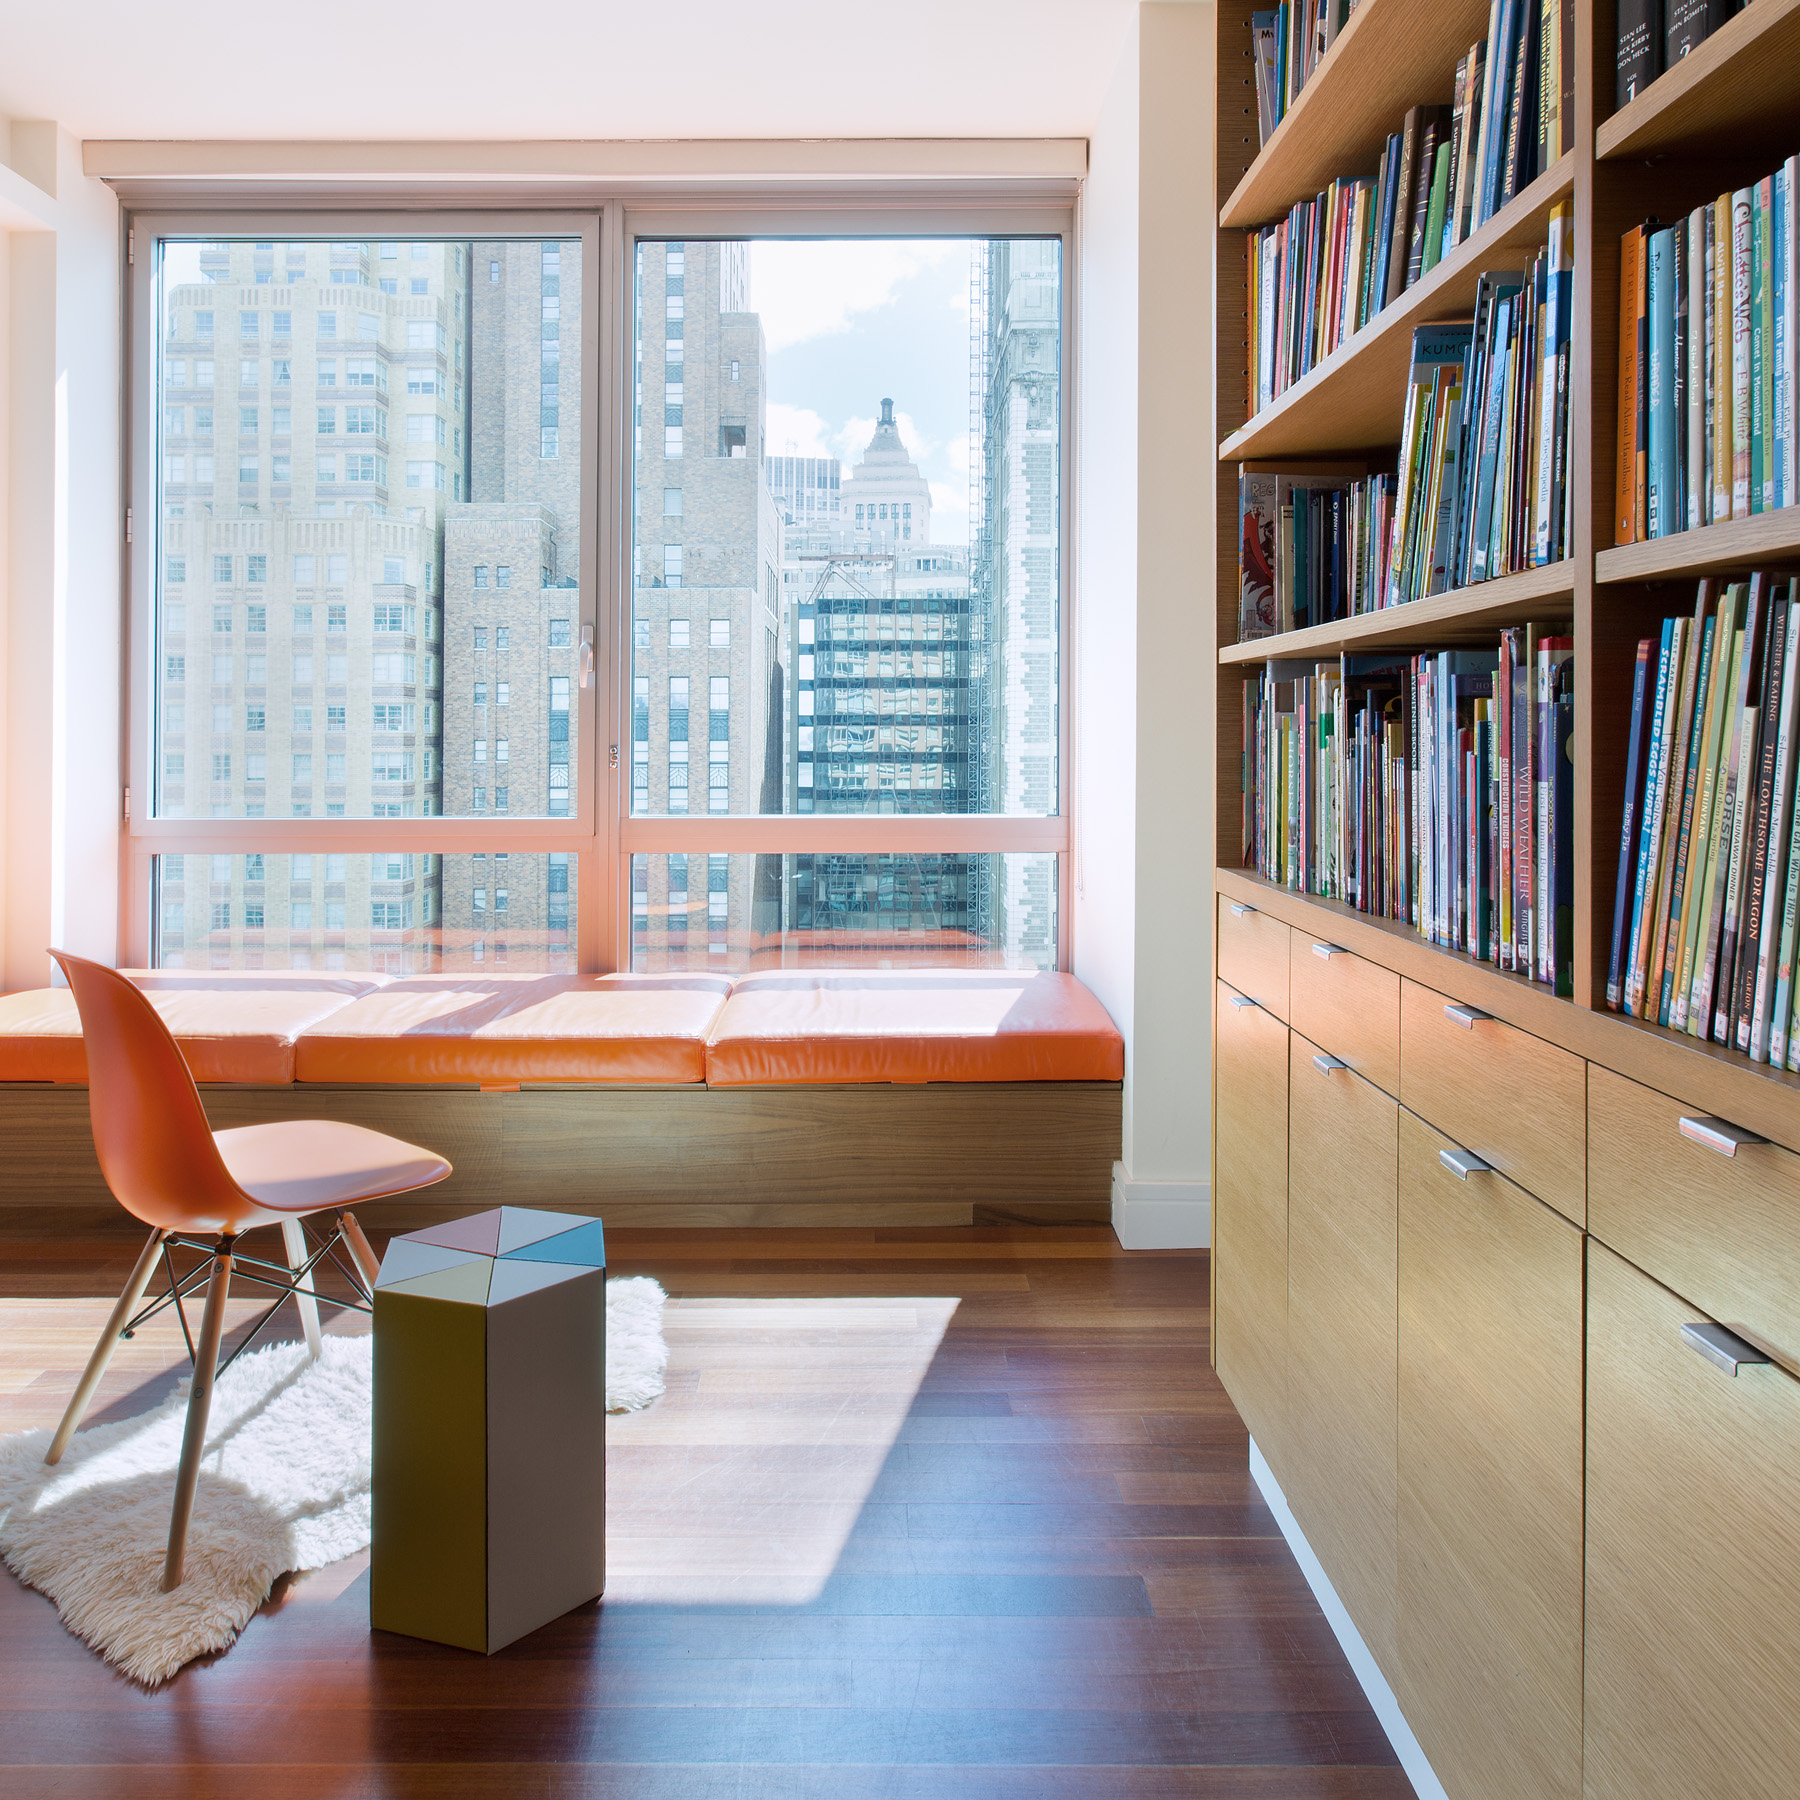 SonyaLee_30WestStreet_Bookshelf_1_square.jpg